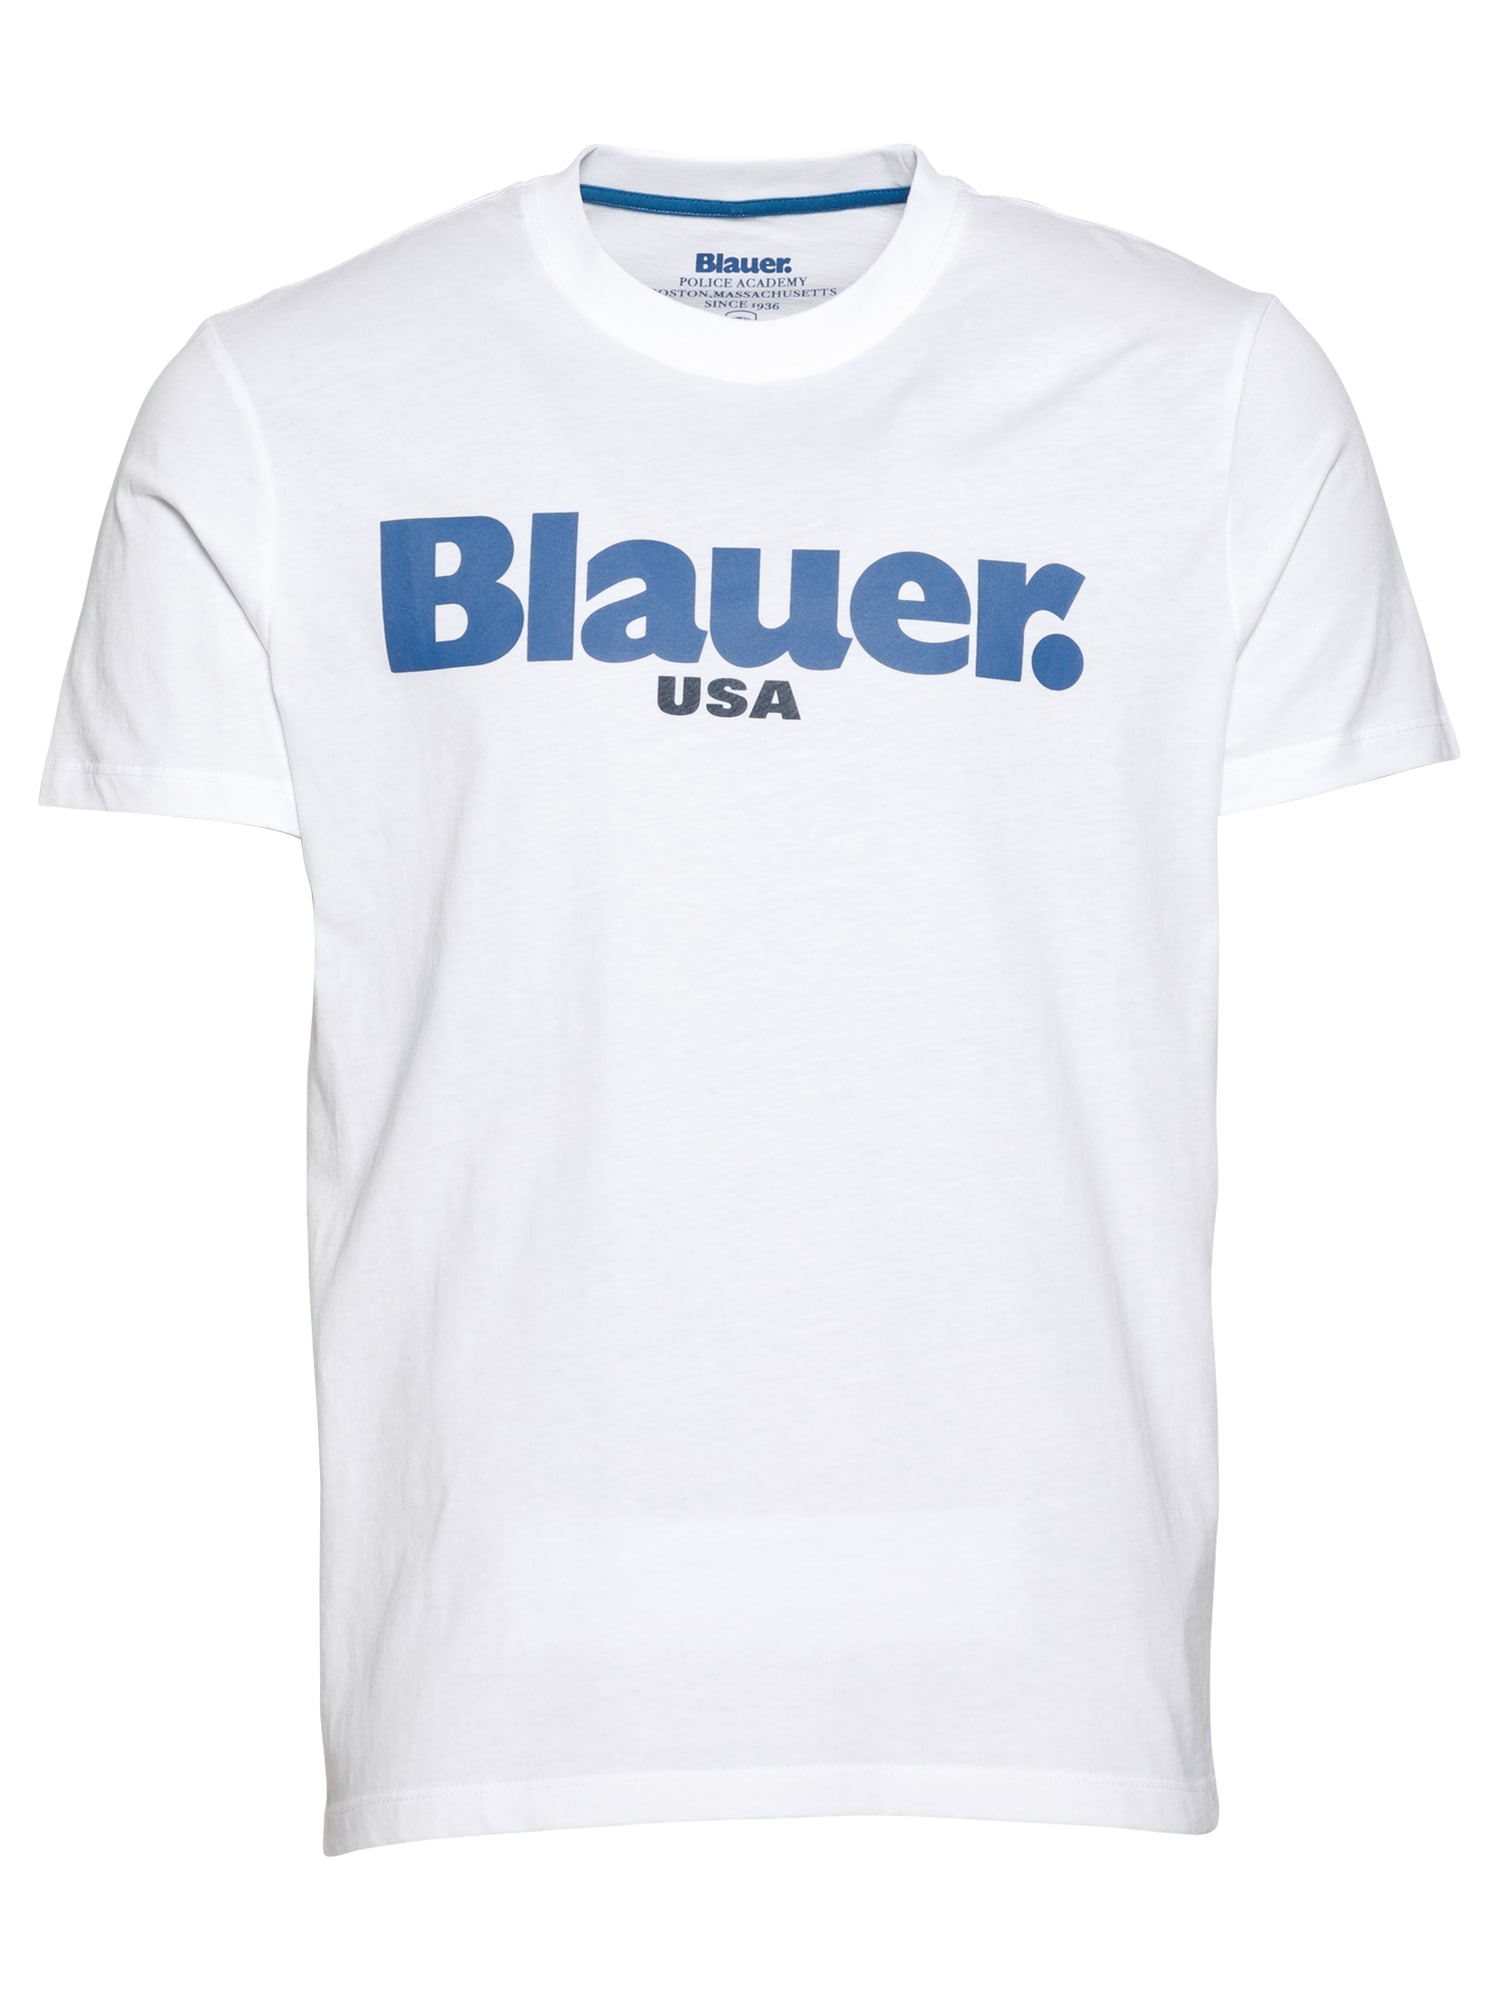 Blauer.USA Marškinėliai 'MANICA CORTA' balta / mėlyna